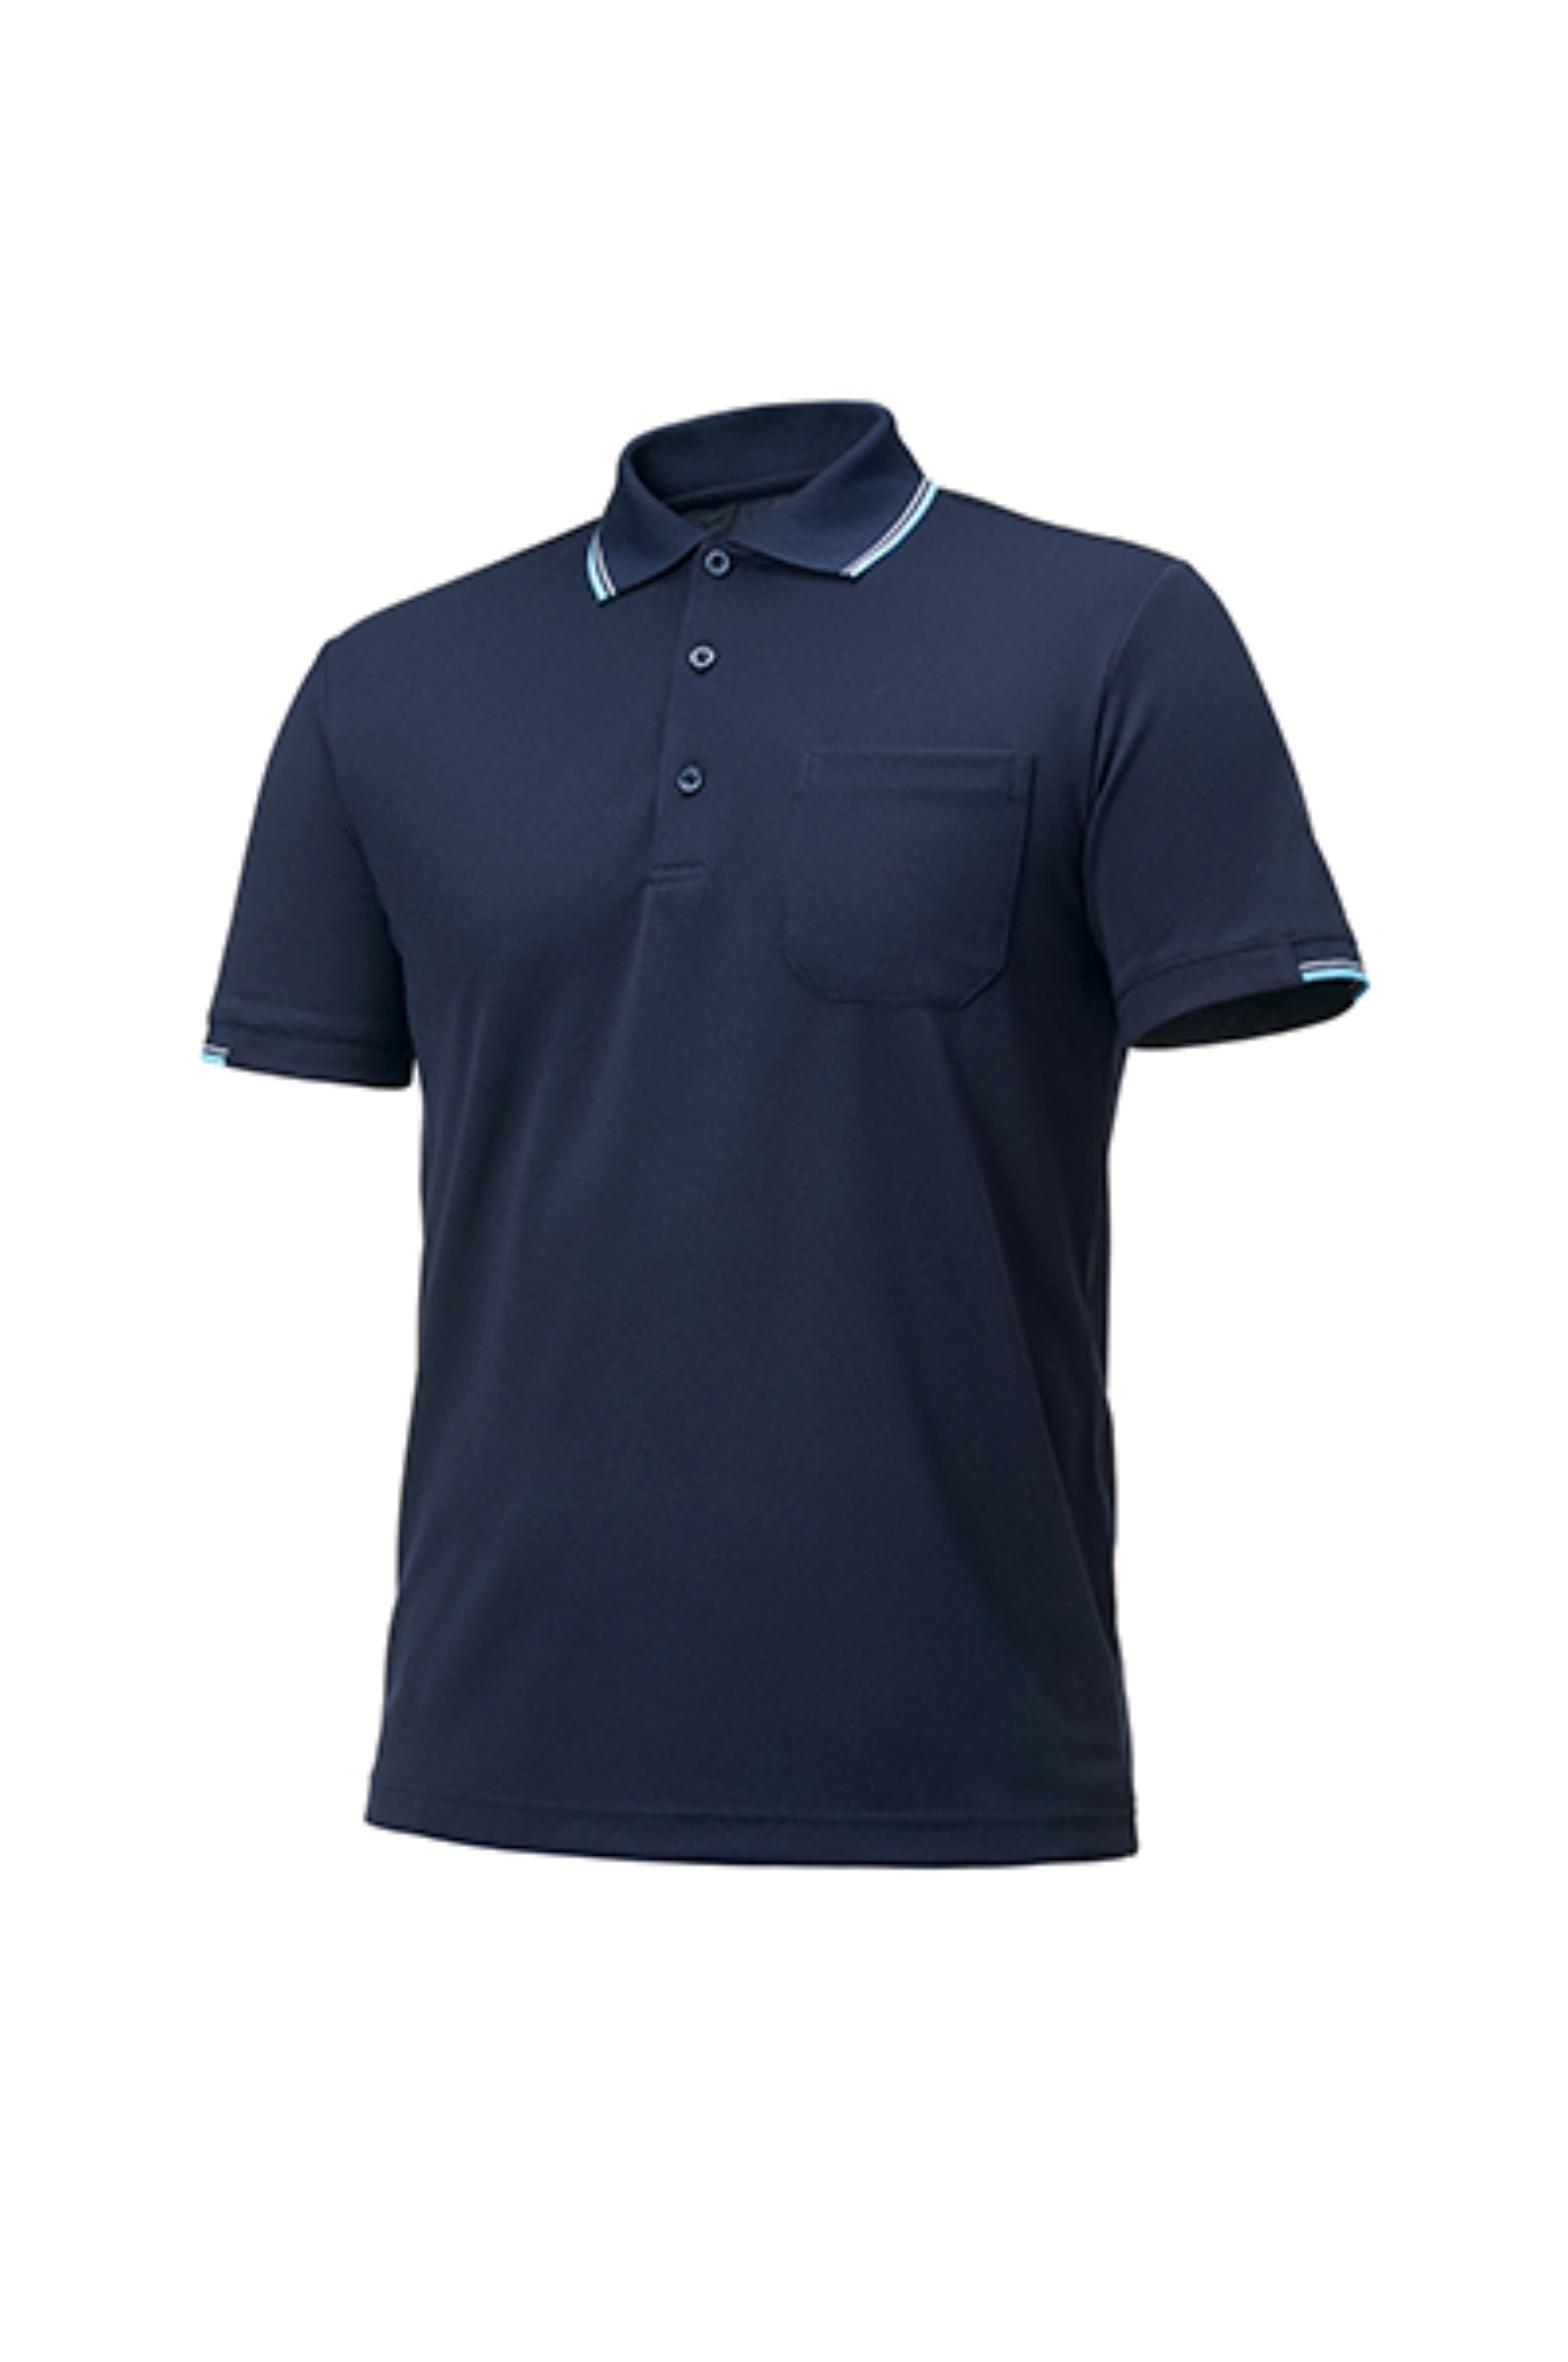 ZB-T1032 (네이비)지벤 작업복 티셔츠(쿨론)